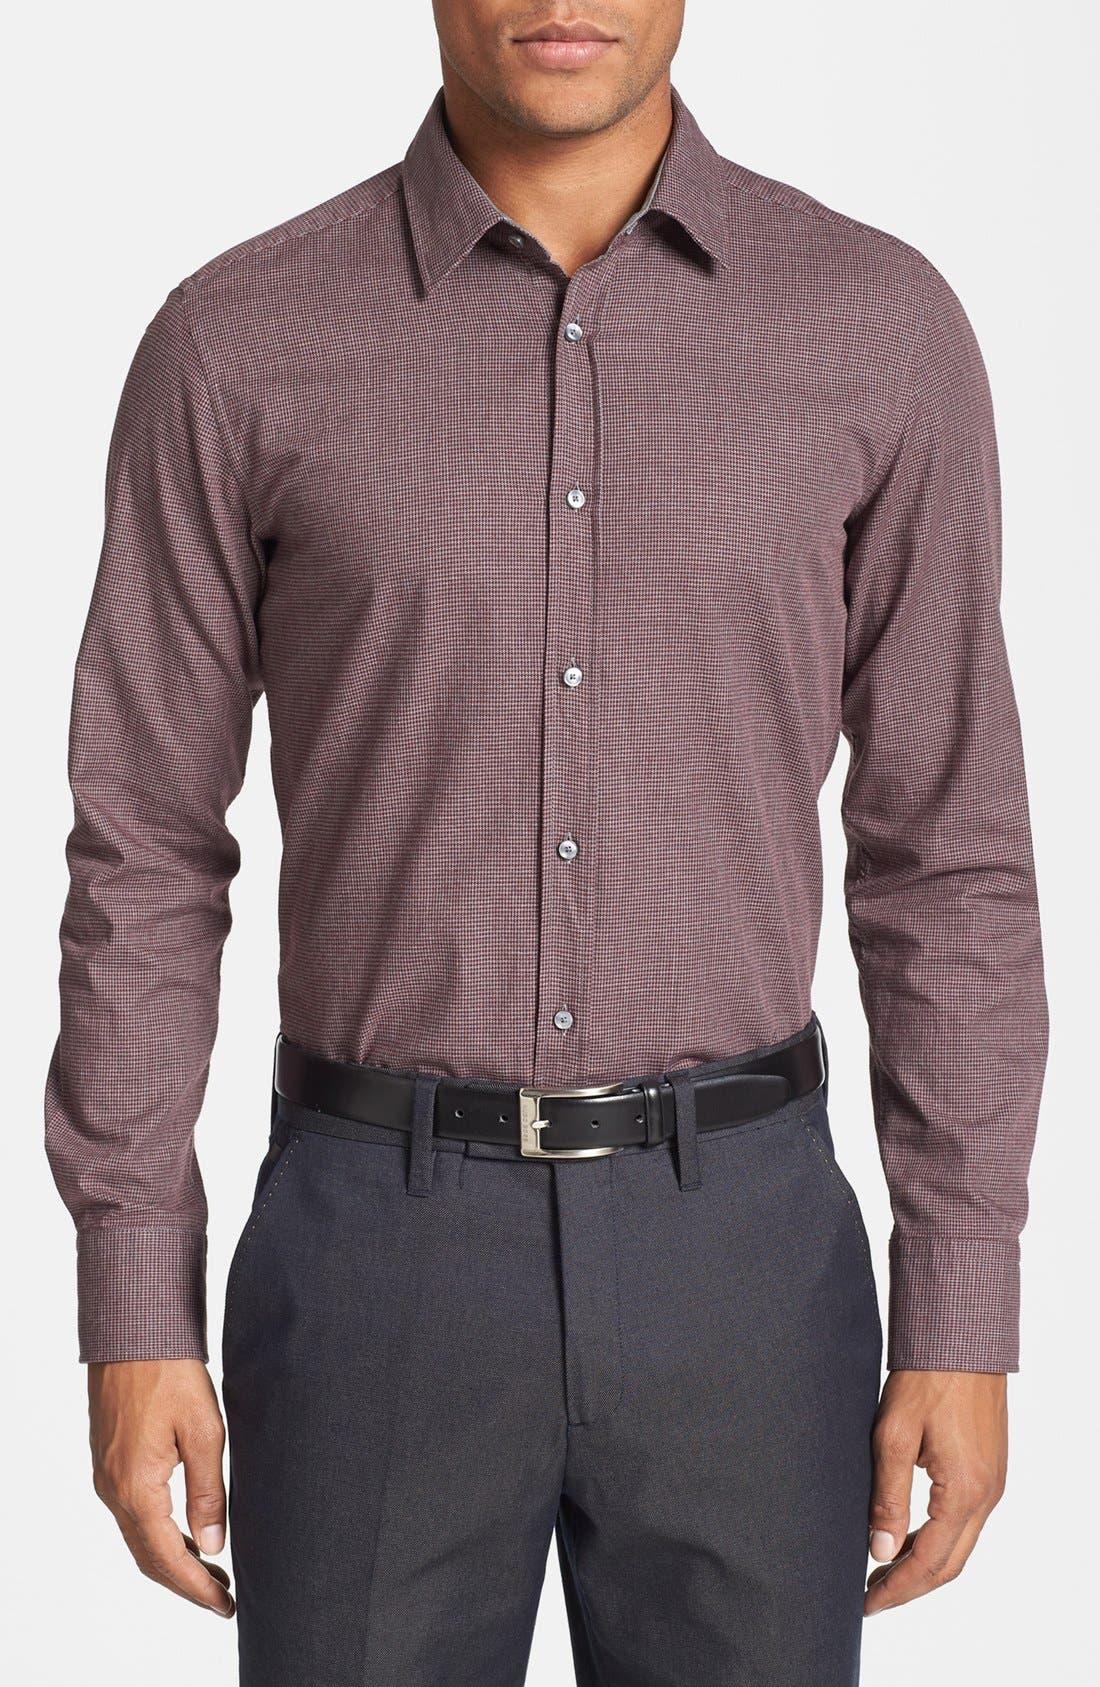 Alternate Image 1 Selected - BOSS HUGO BOSS 'Ronny' Mélange Houndstooth Sport Shirt